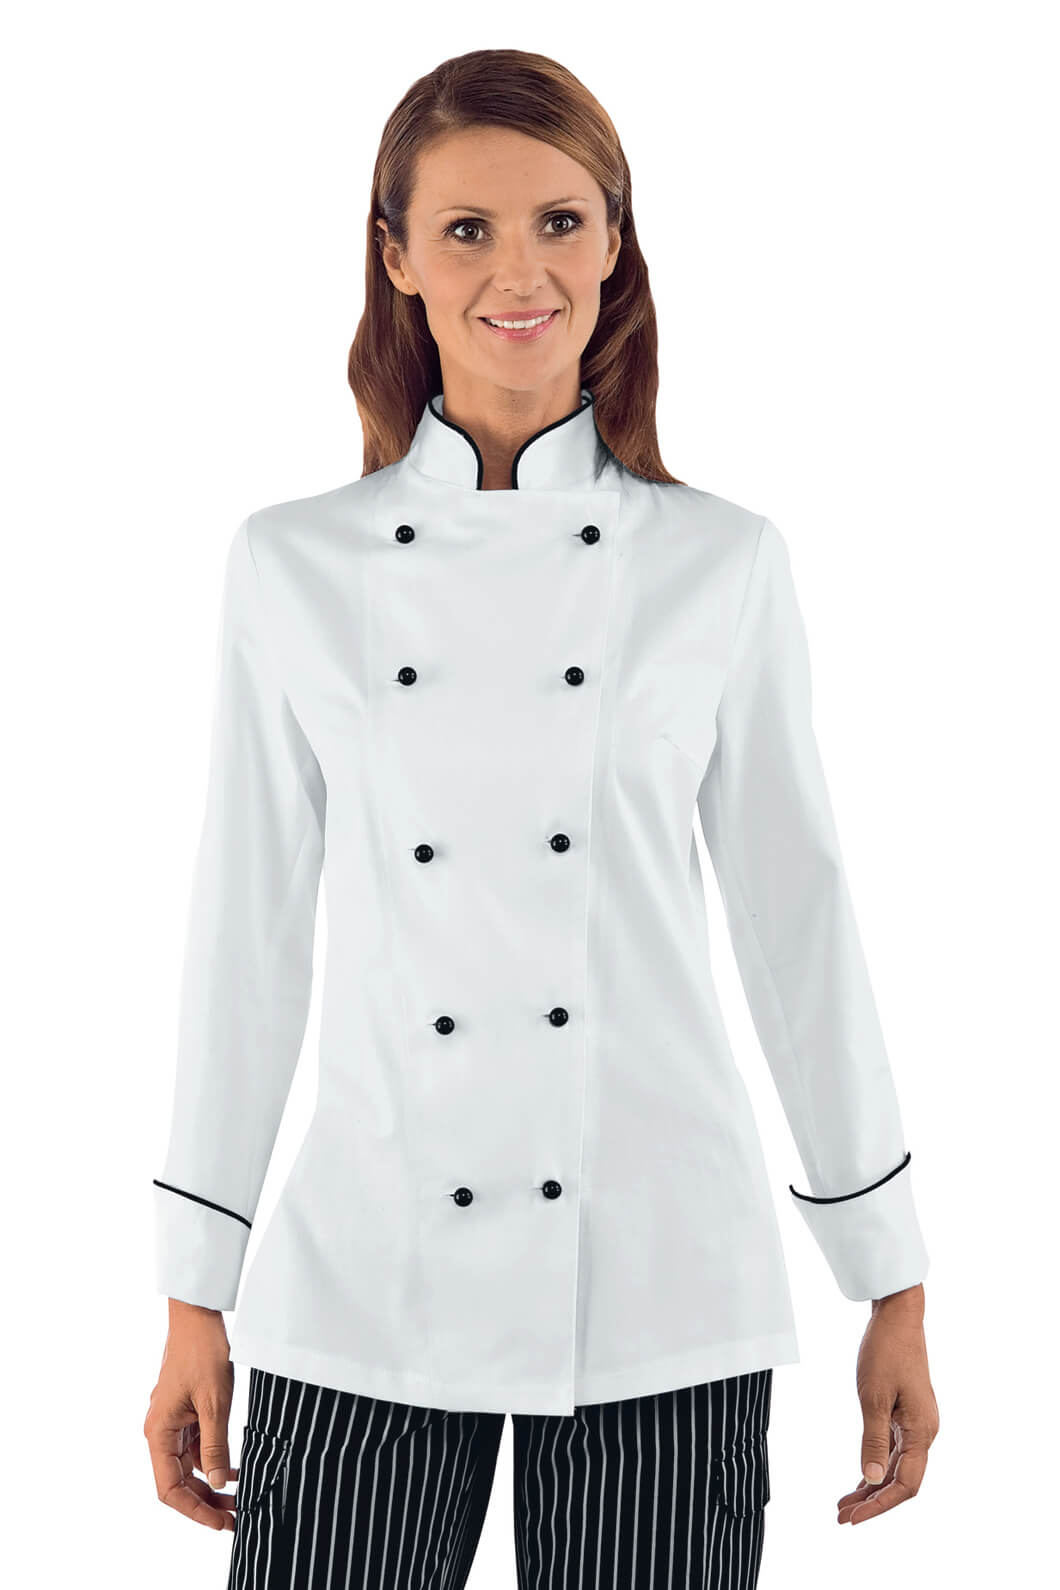 veste de cuisine femme granchef blanc liser noir 100 coton. Black Bedroom Furniture Sets. Home Design Ideas